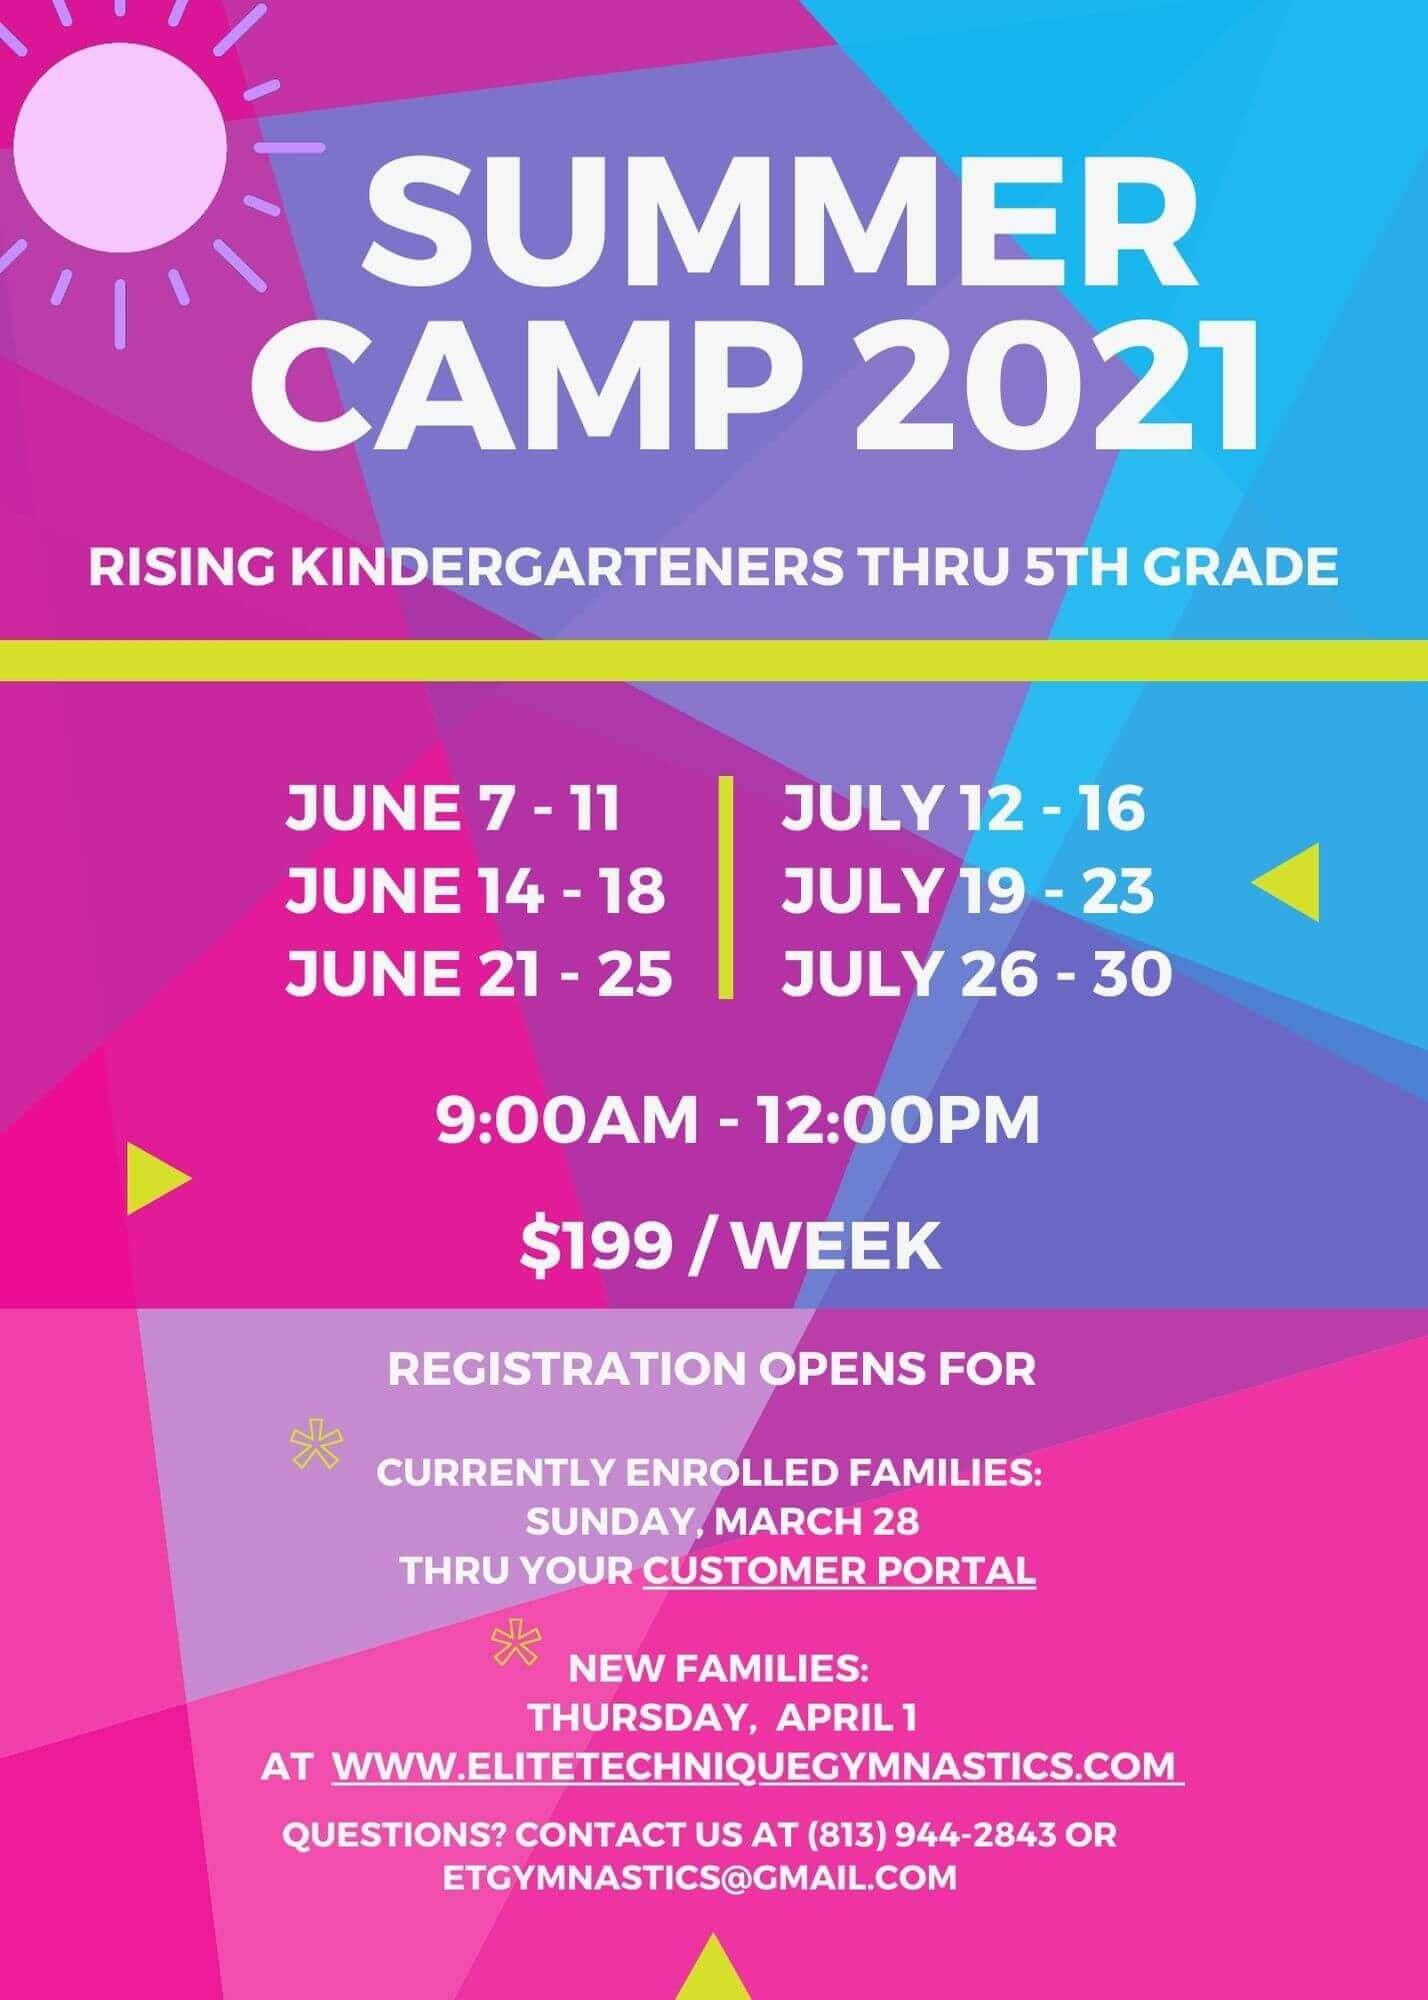 Summer camps for kindergarteners thru fifth grade 